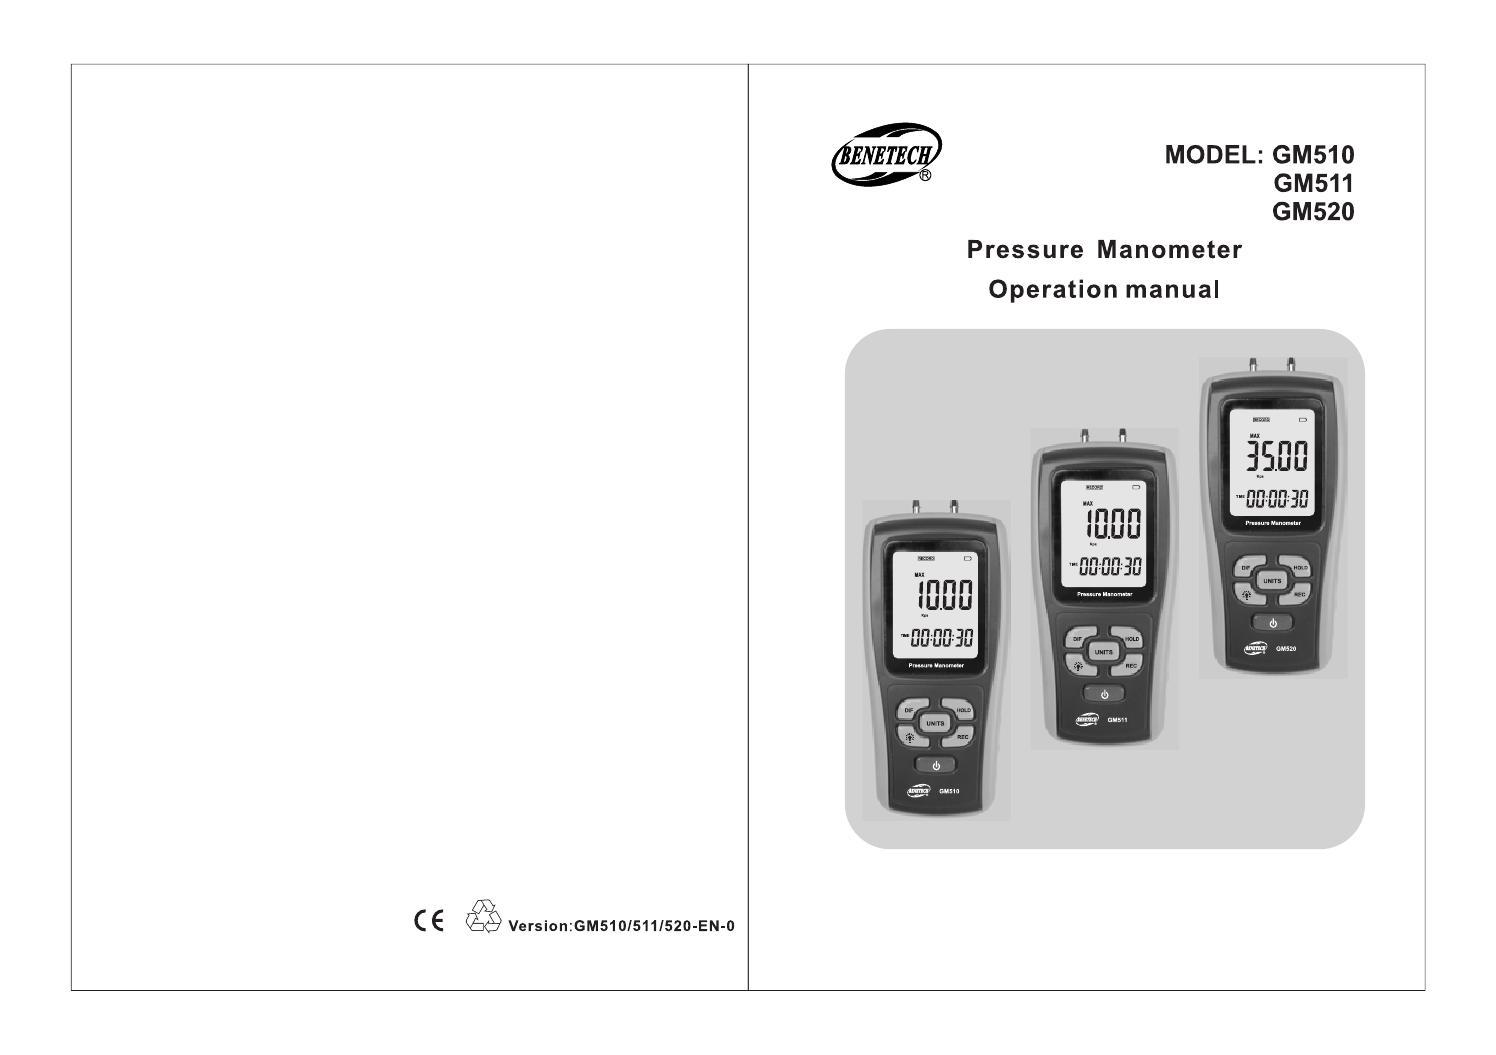 Ios 511 user manual array manual gm510 511 520 by juan ortega issuu rh issuu fandeluxe Gallery